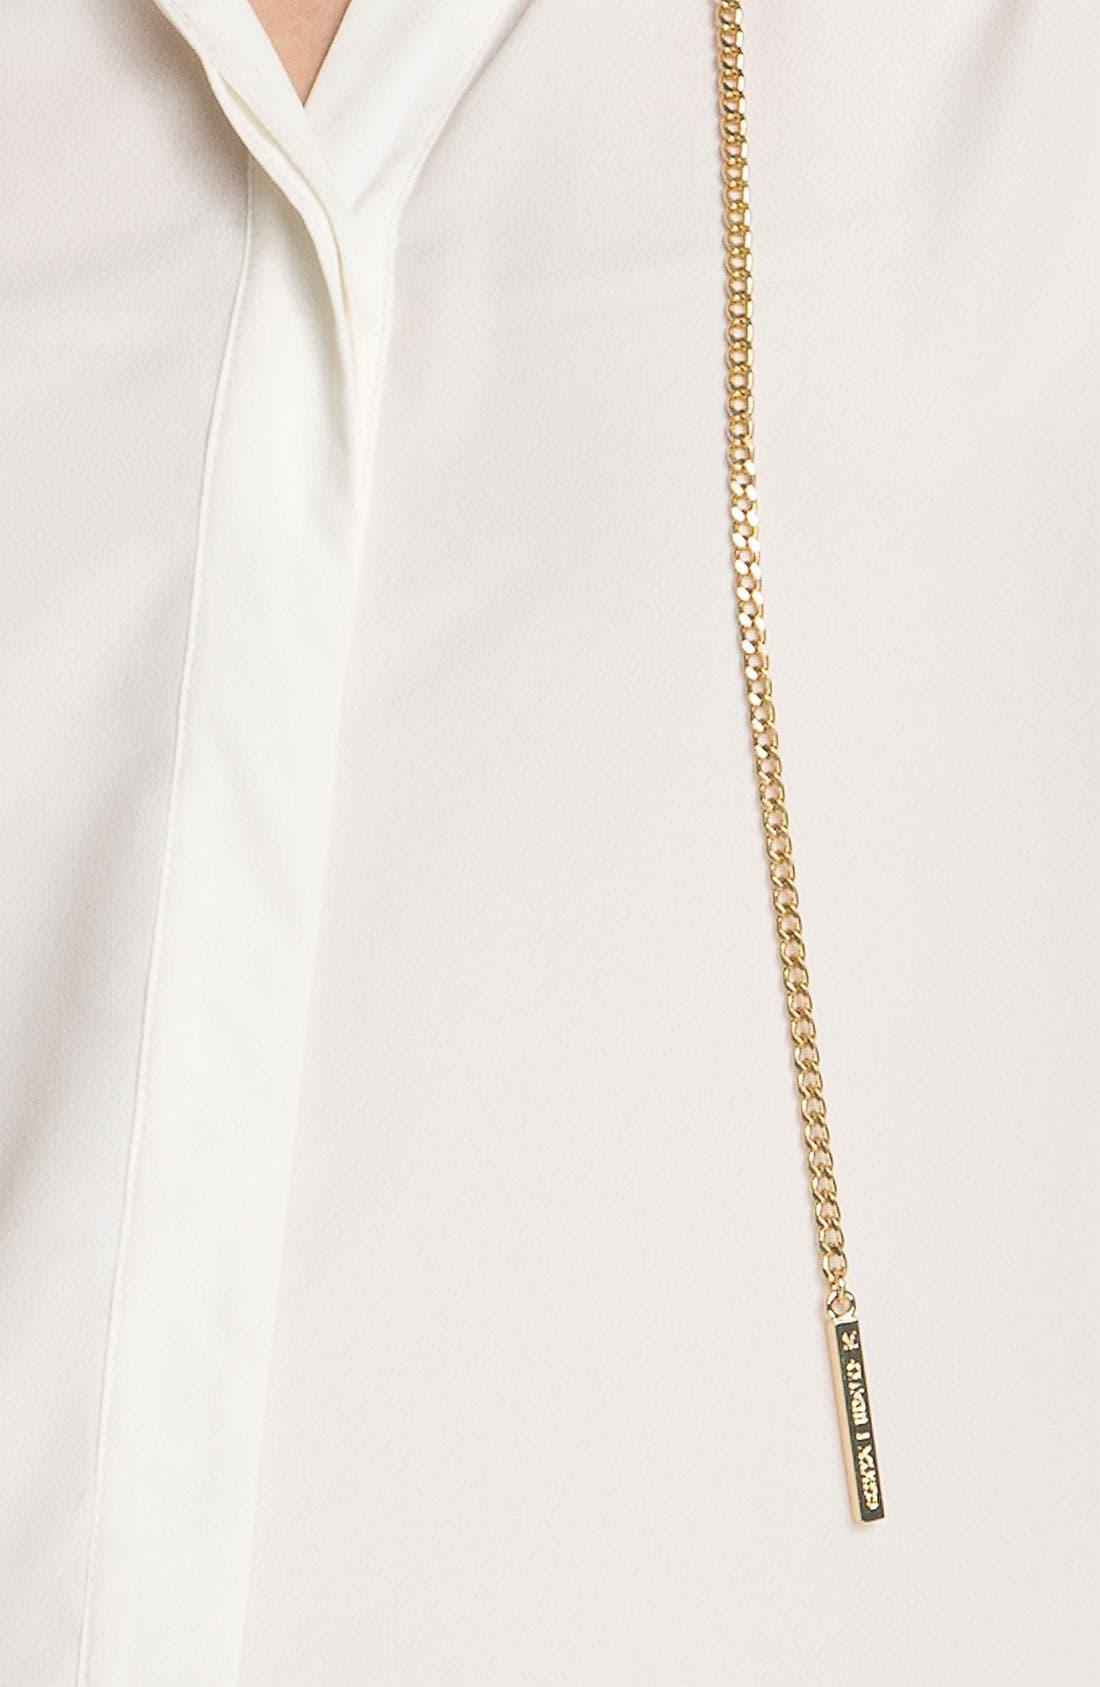 Alternate Image 3  - MICHAEL Michael Kors Chain Detail Crepe Blouse